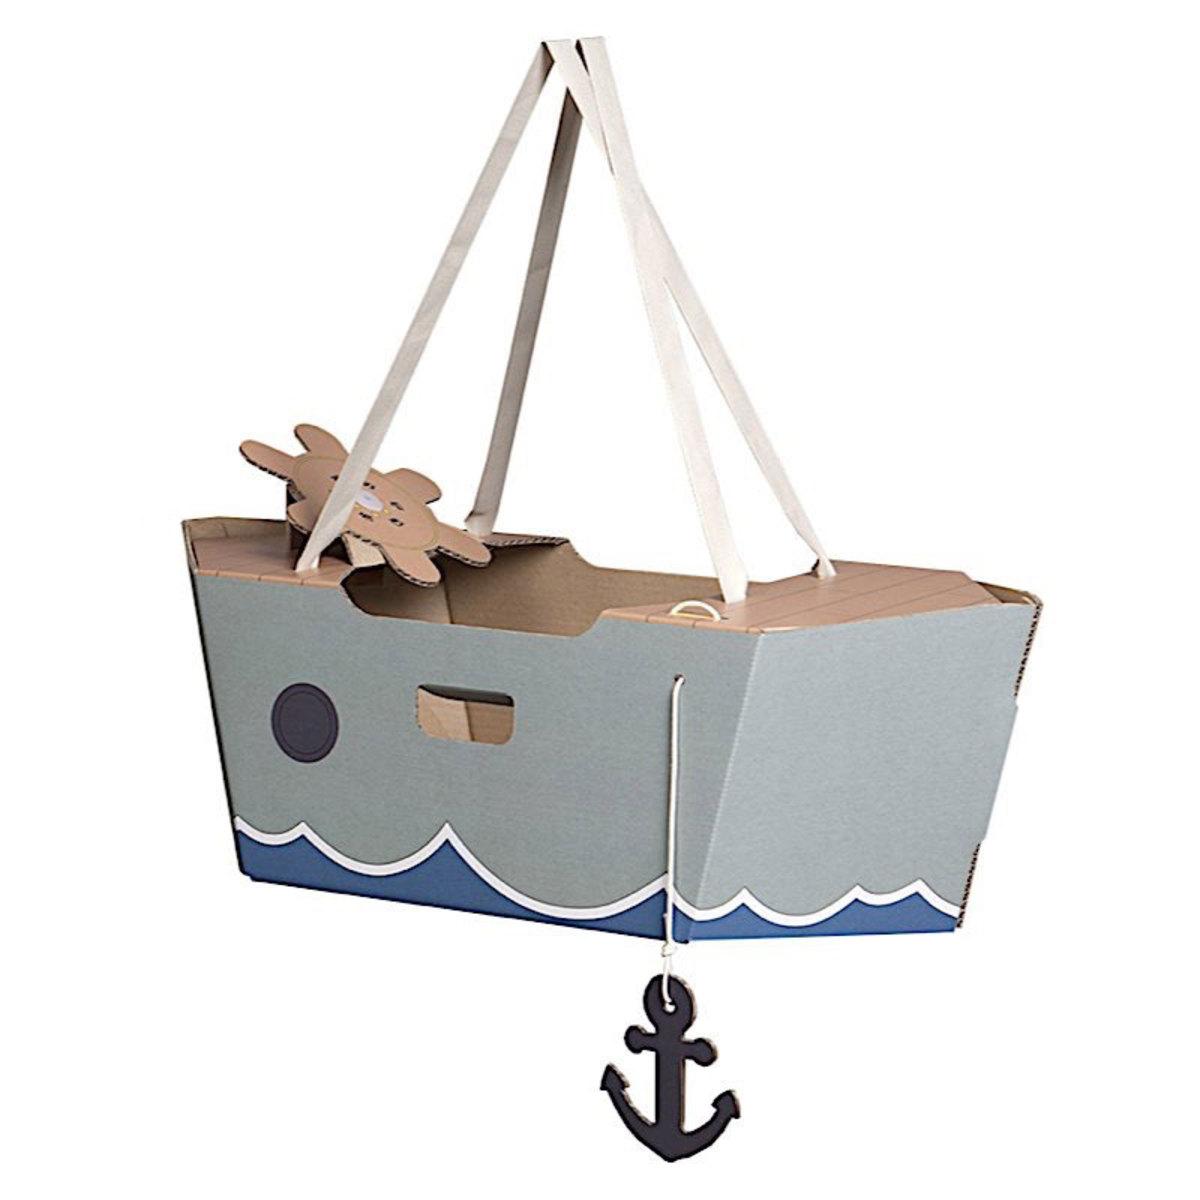 Mes premiers jouets Tody Boat Bleu Tody Boat Bleu